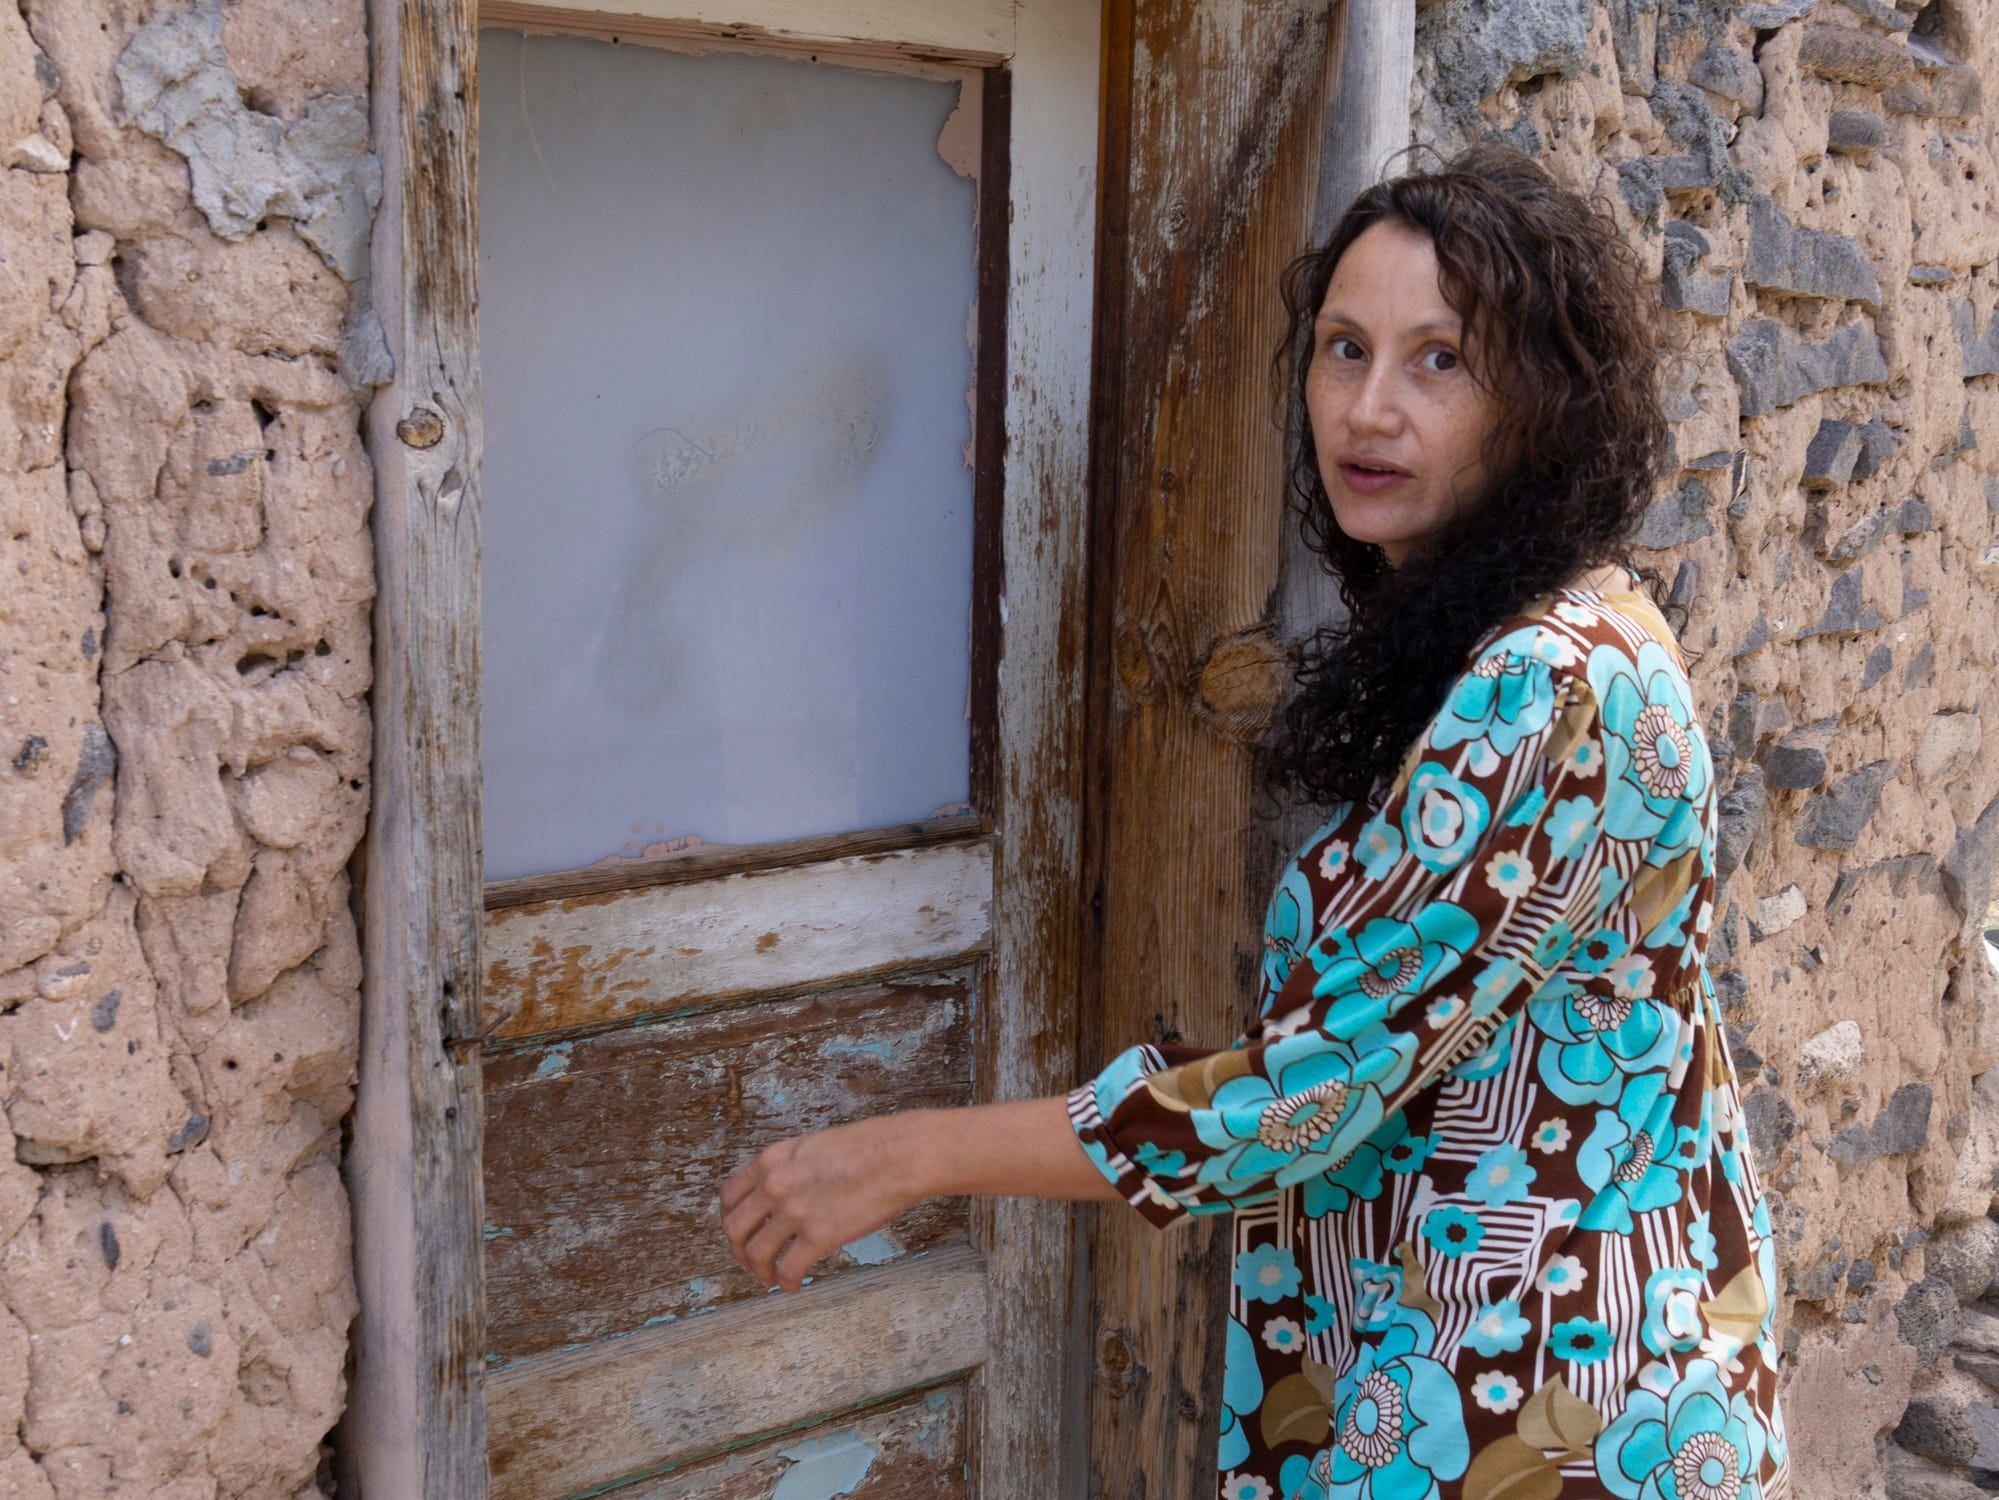 Emilia at the soterrano in Cañones.